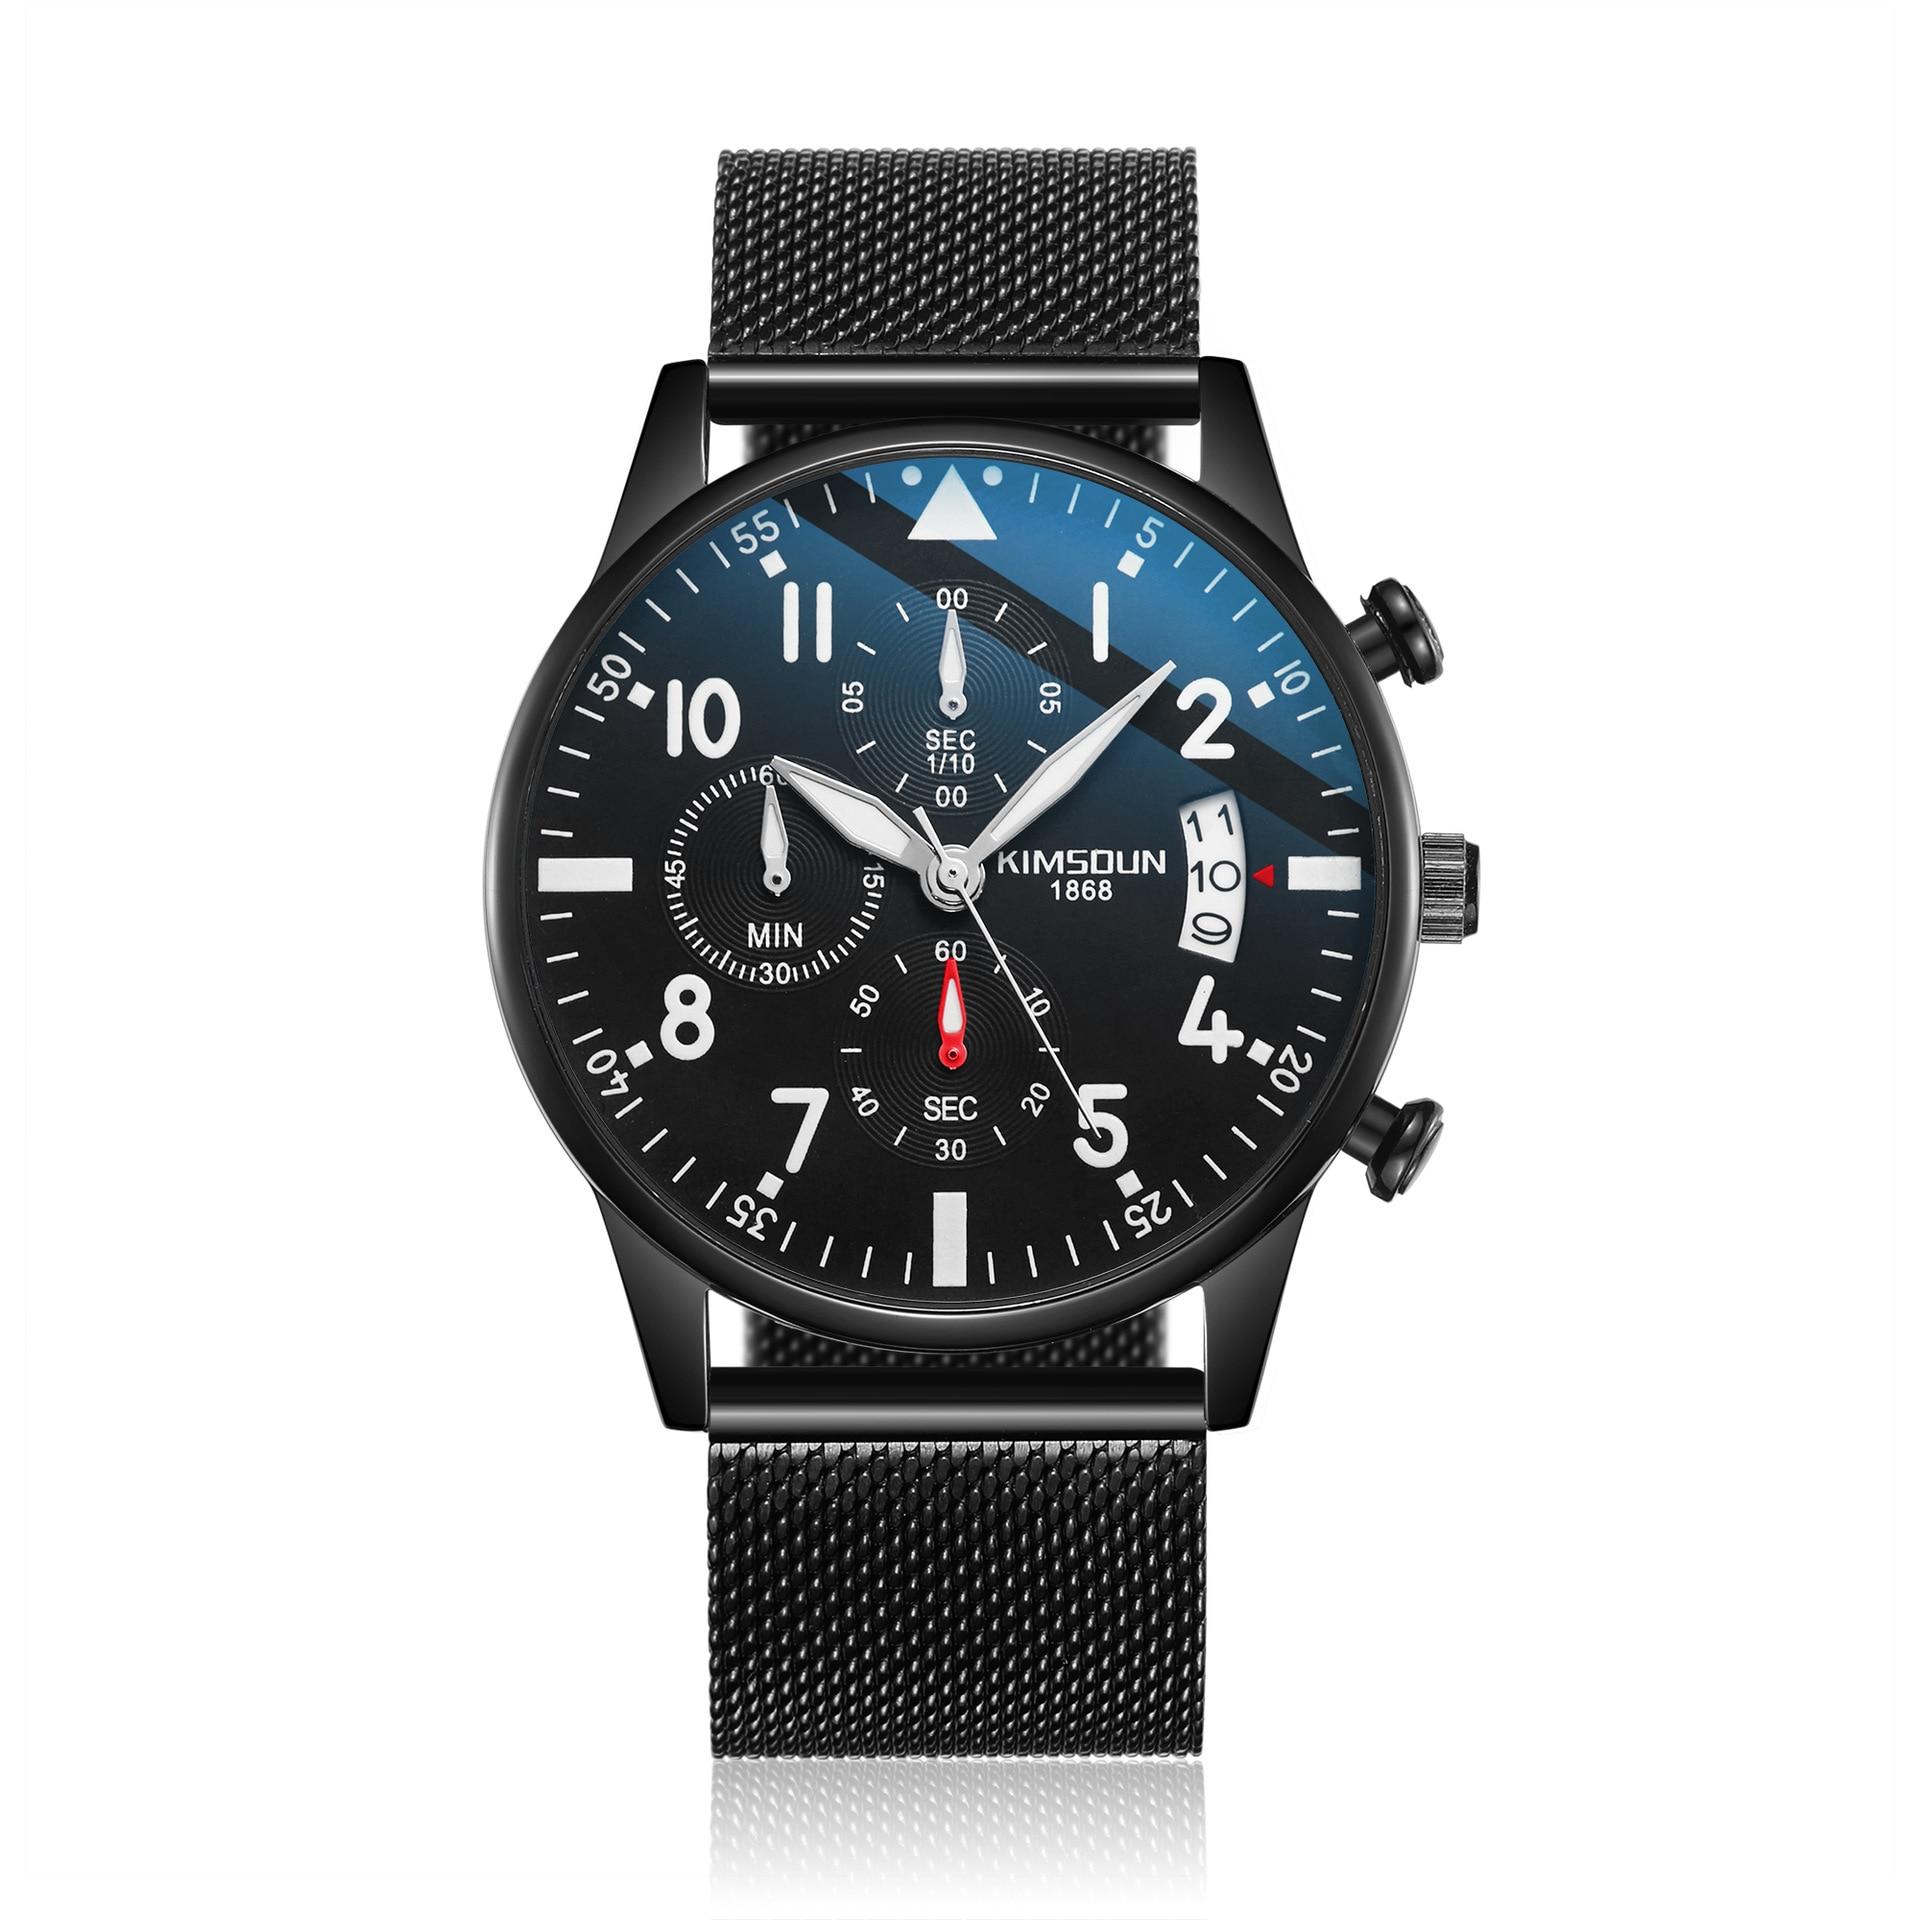 KIMSDUN 2019 Mens Watches Top Brand reloj militar Sports